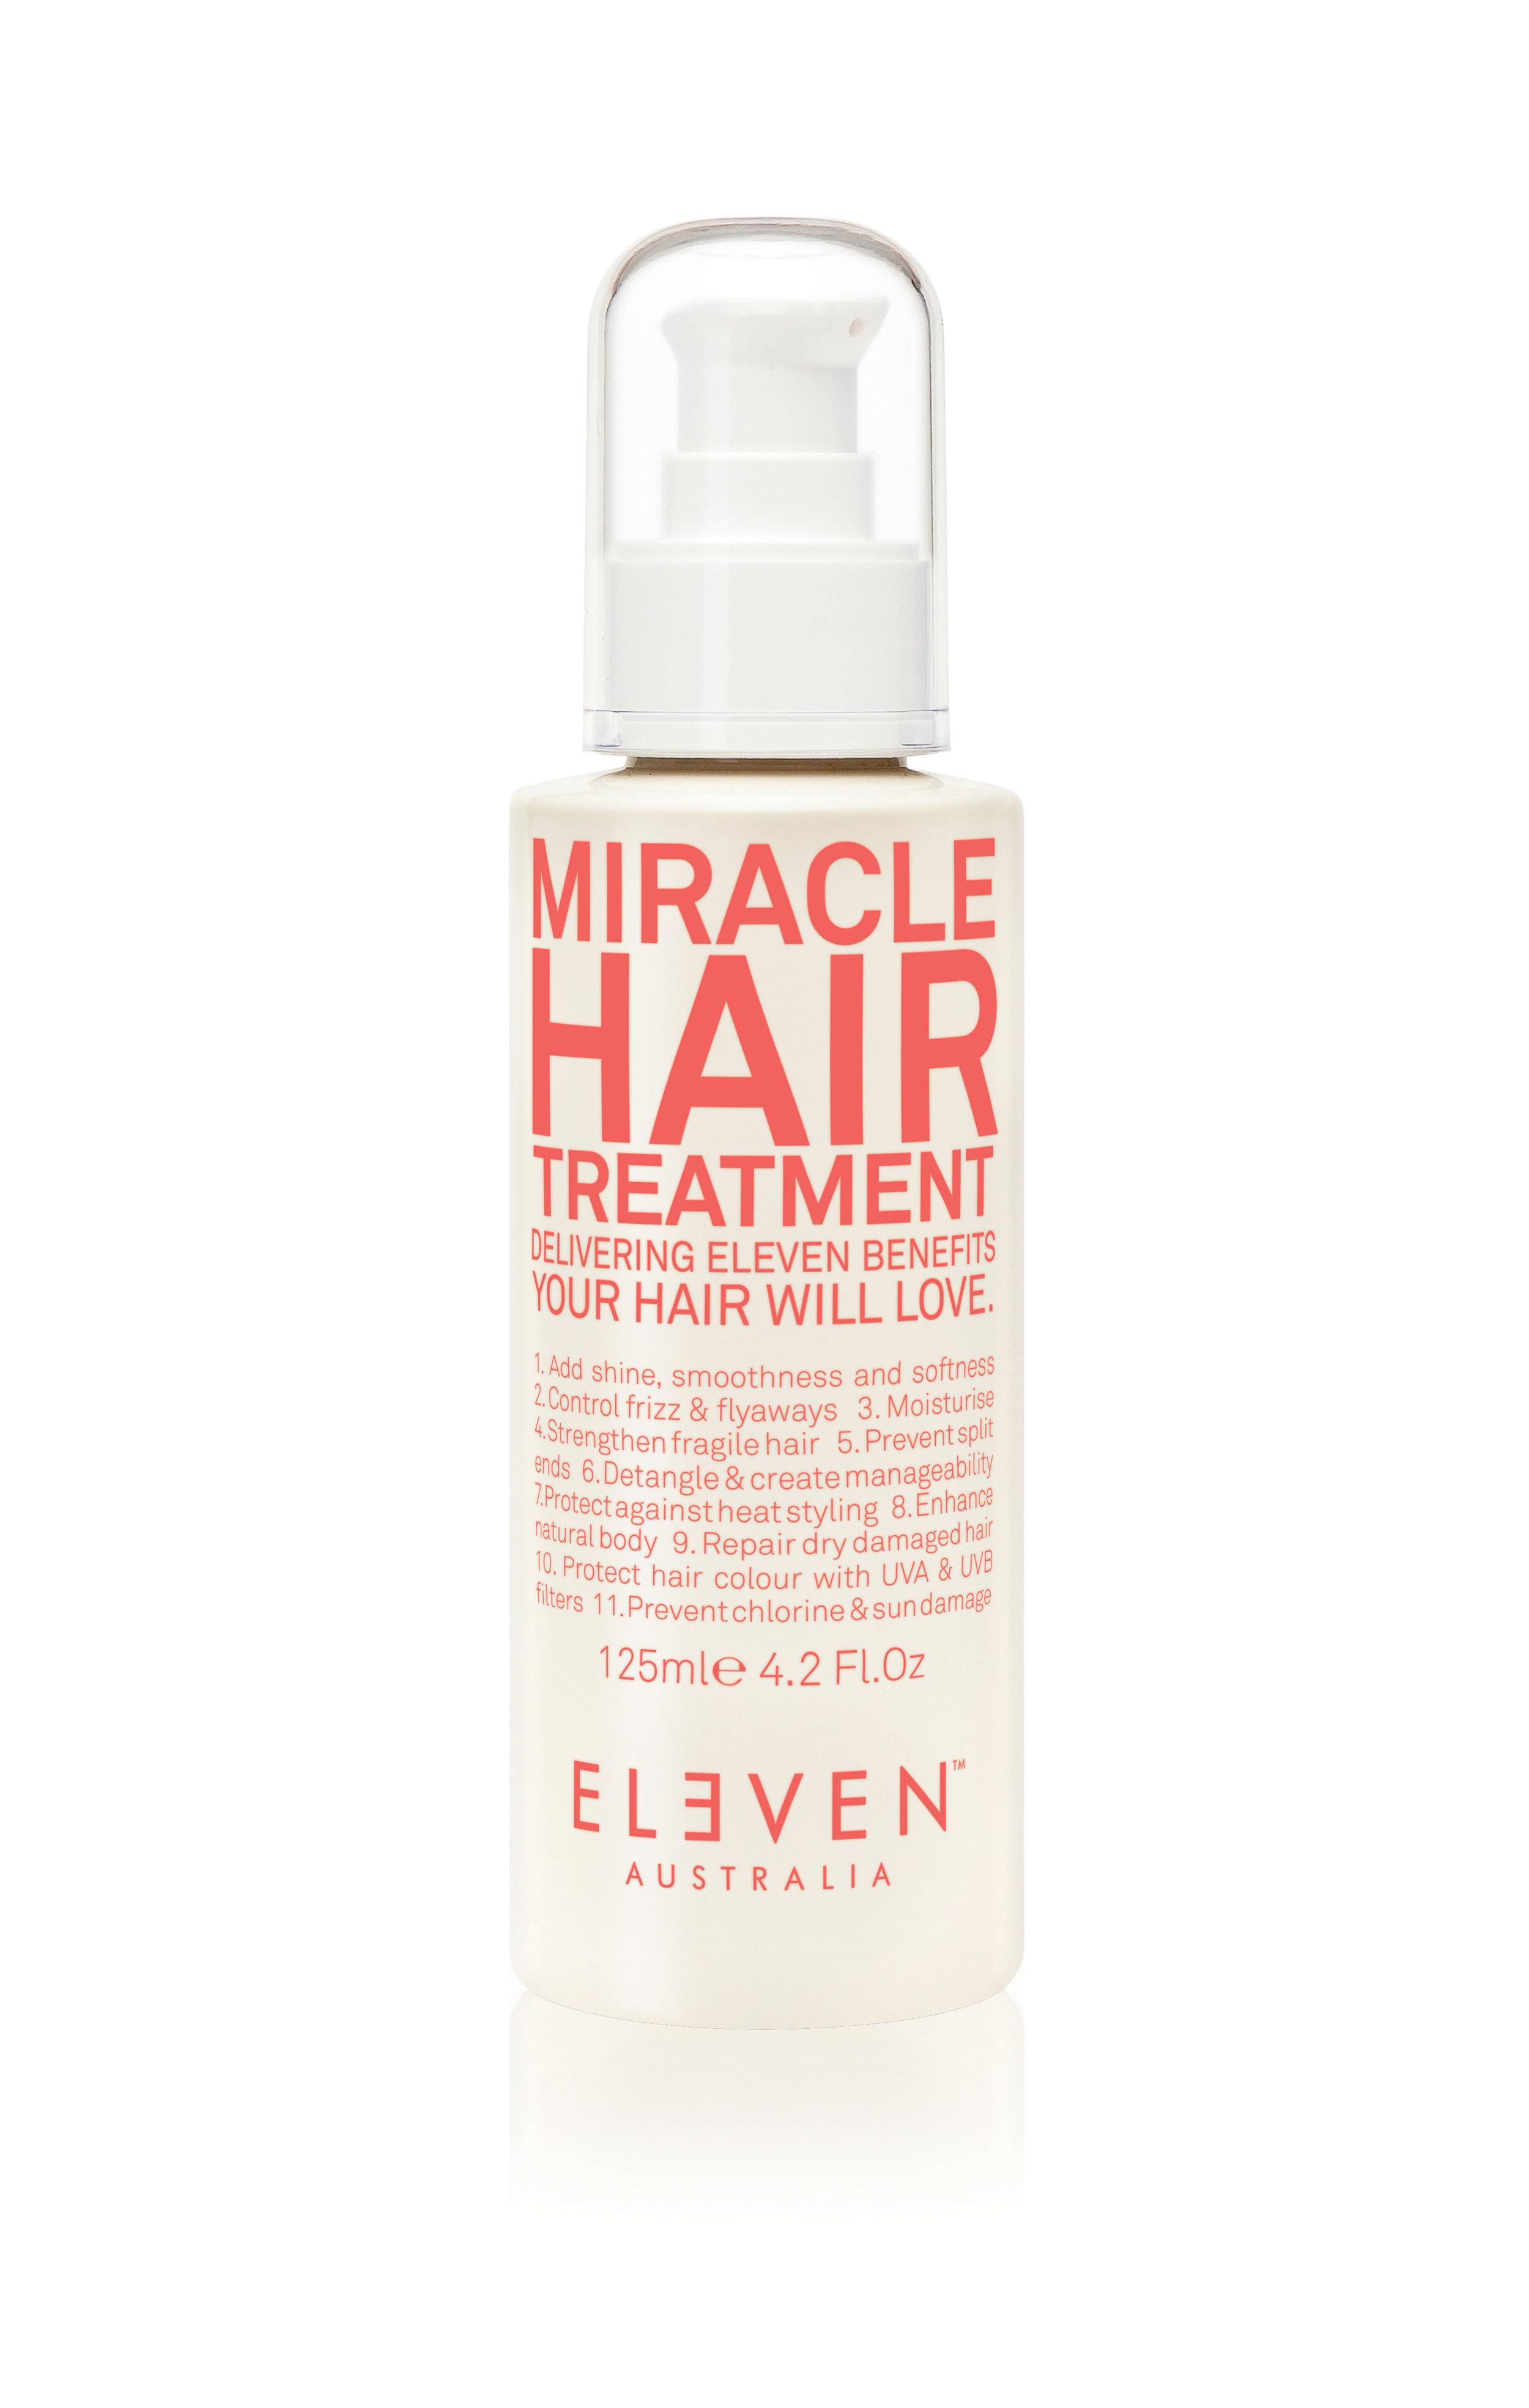 ELEVEN Australia Miracle Hair Treatment.jpg